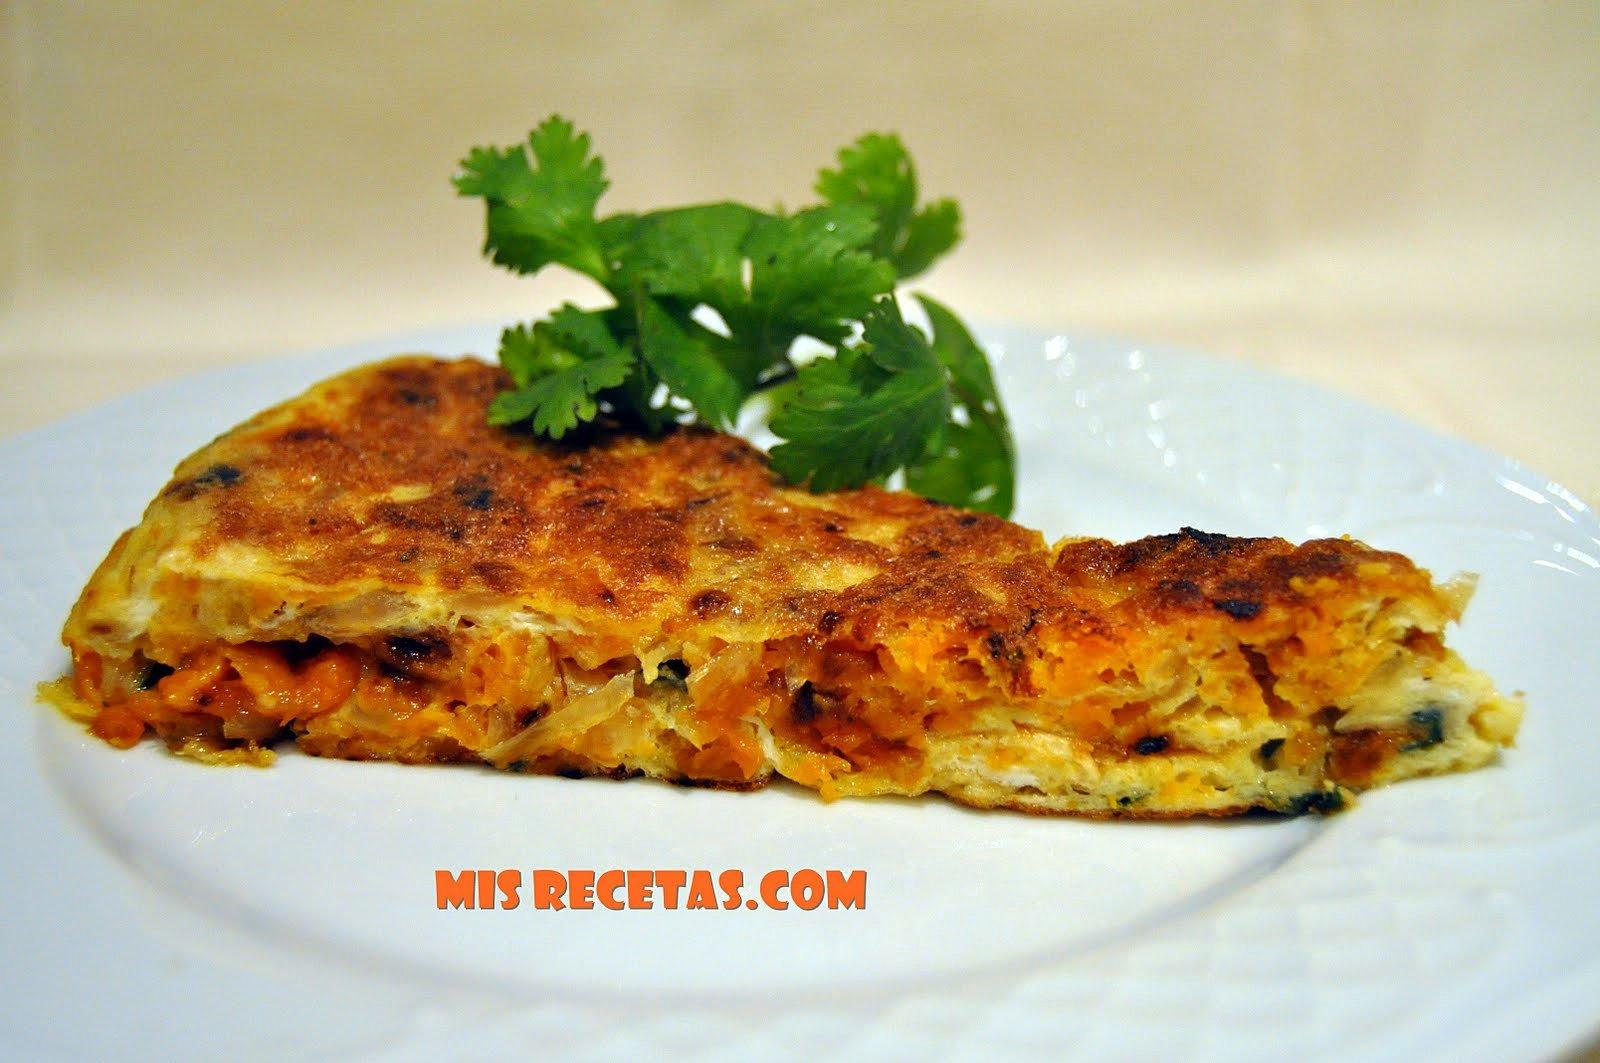 Mis recetas com tortilla de calabaza frita for Calabaza frita